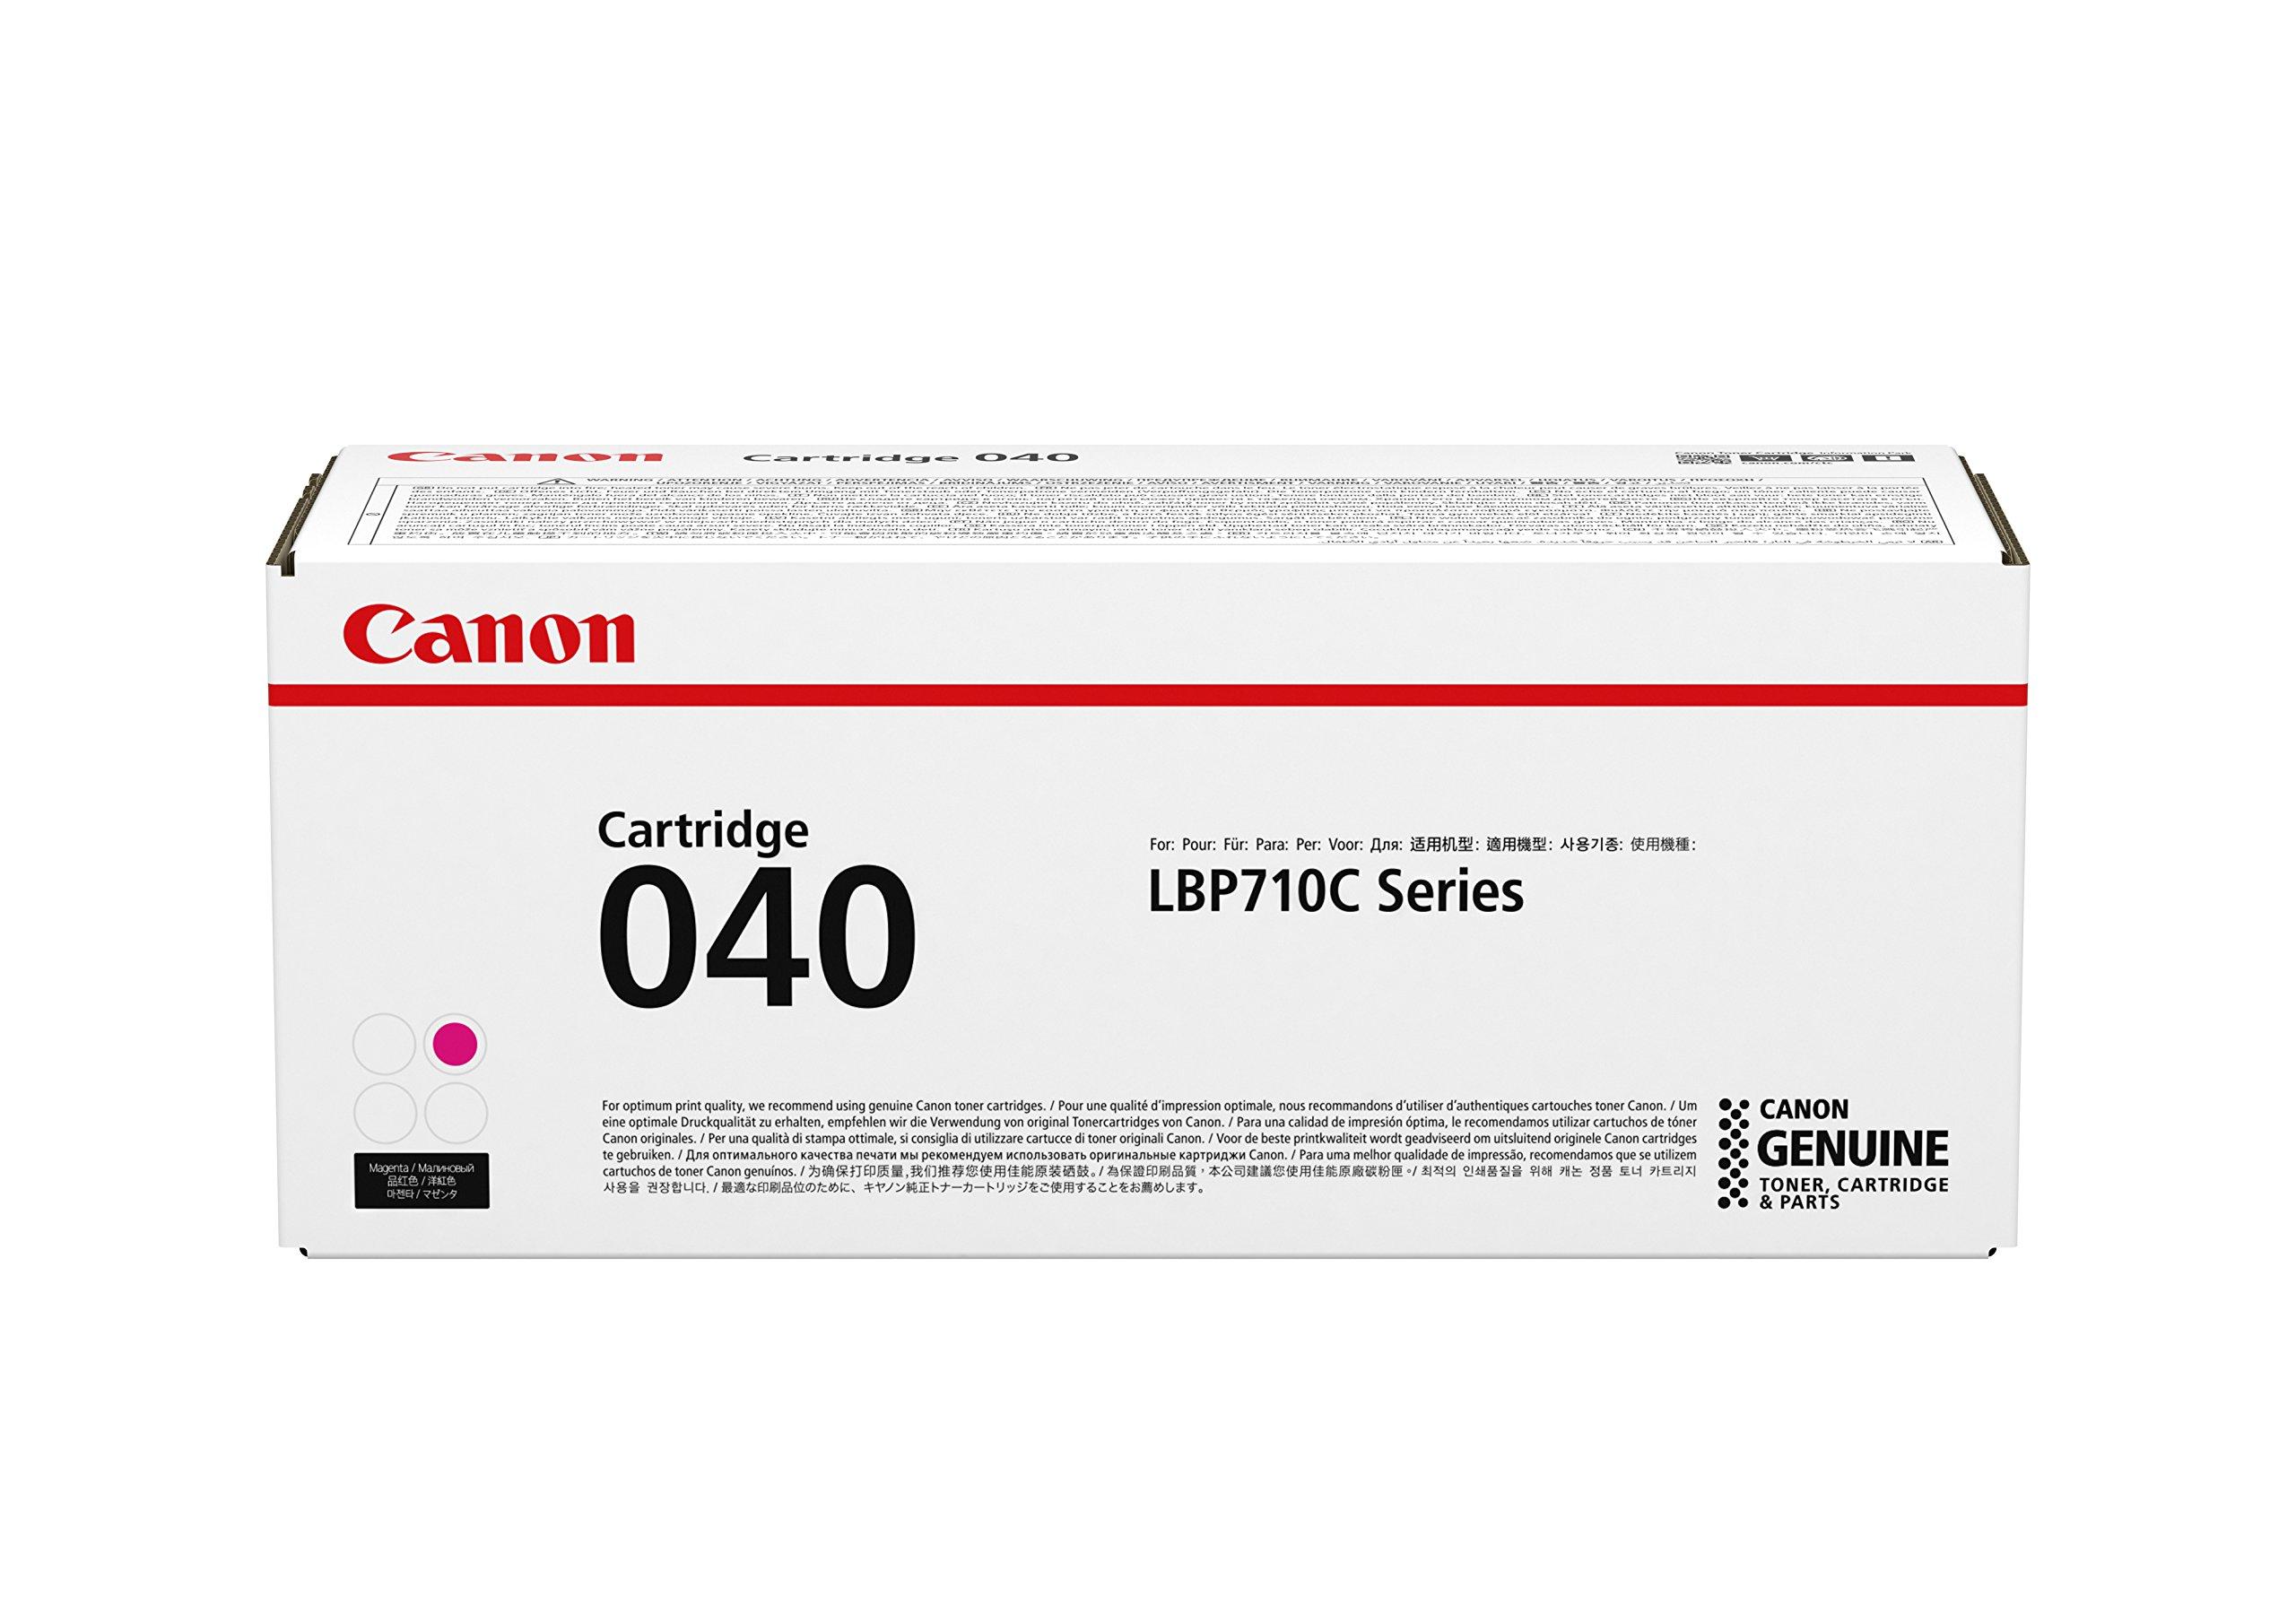 Canon Genuine Toner, Cartridge 040 Magenta (0456C001), 1 Pack, for Canon Color imageCLASS LBP712Cdn Laser Printer